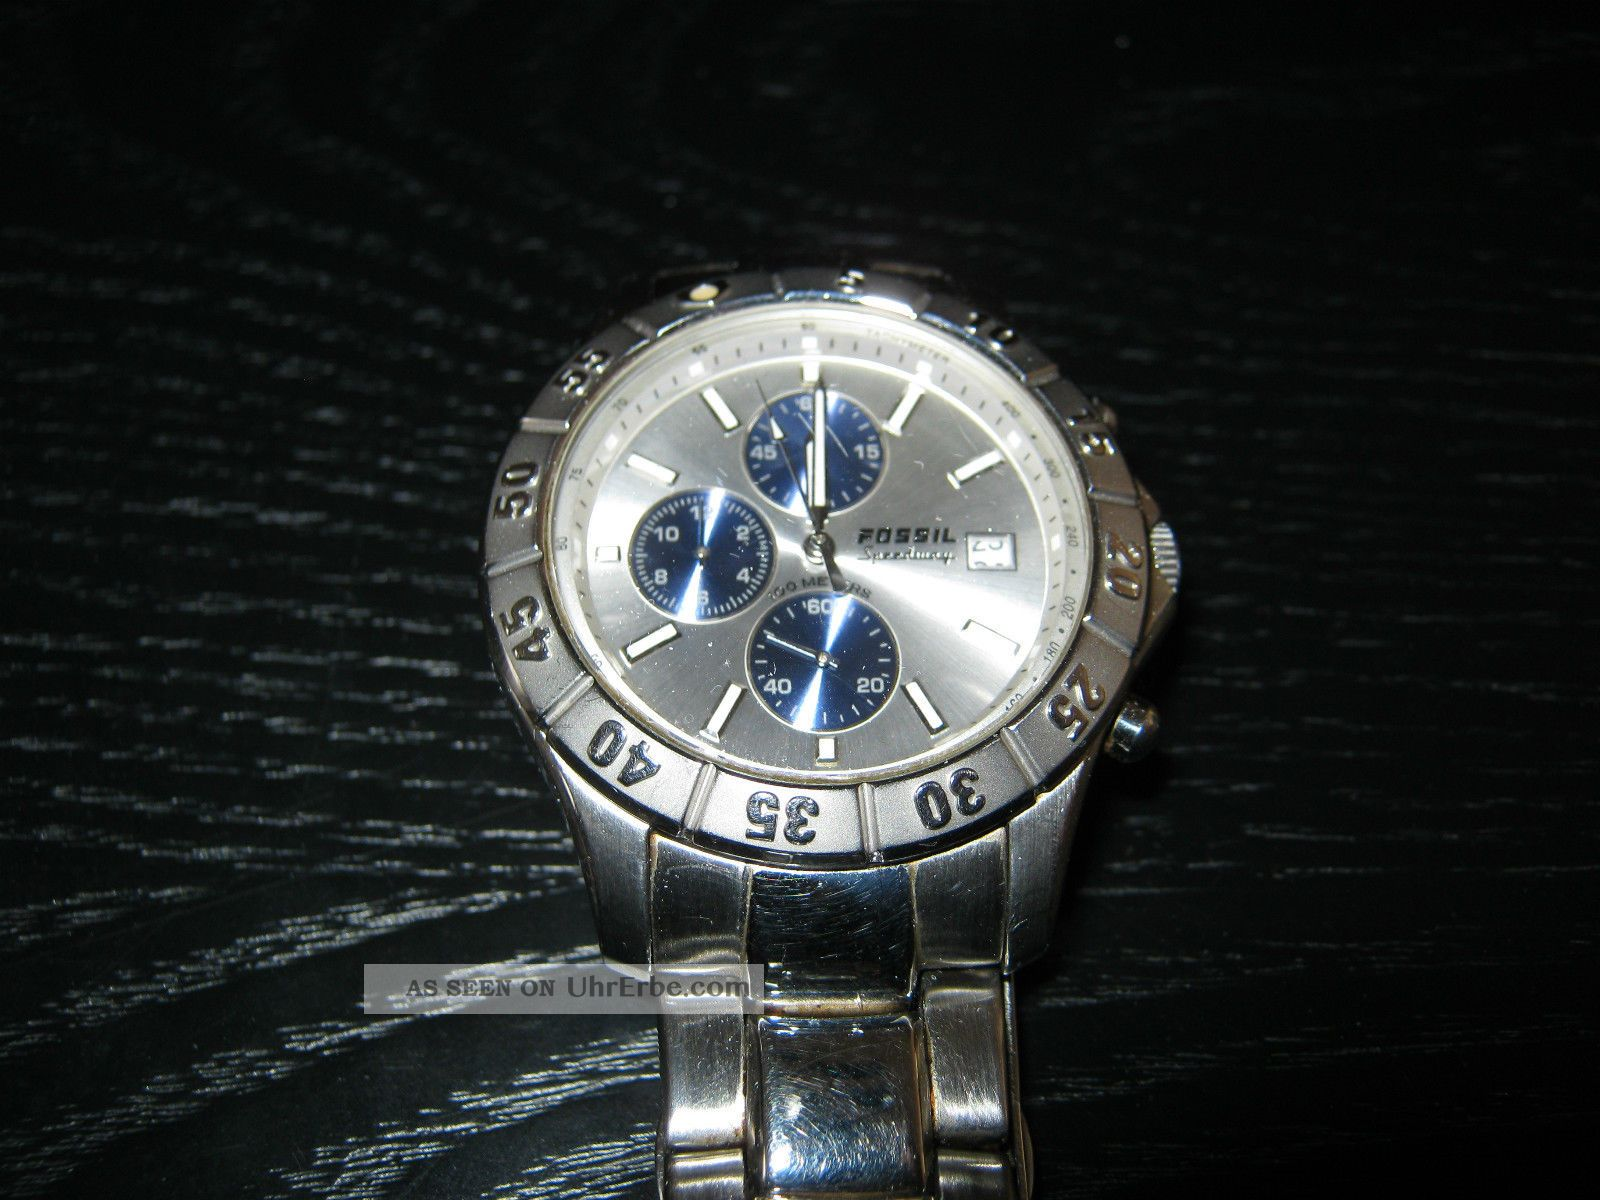 Herren Armbanduhr Fossil Blue Speedway Ch - 2335 Edelstahl,  Instruction Bastler Armbanduhren Bild